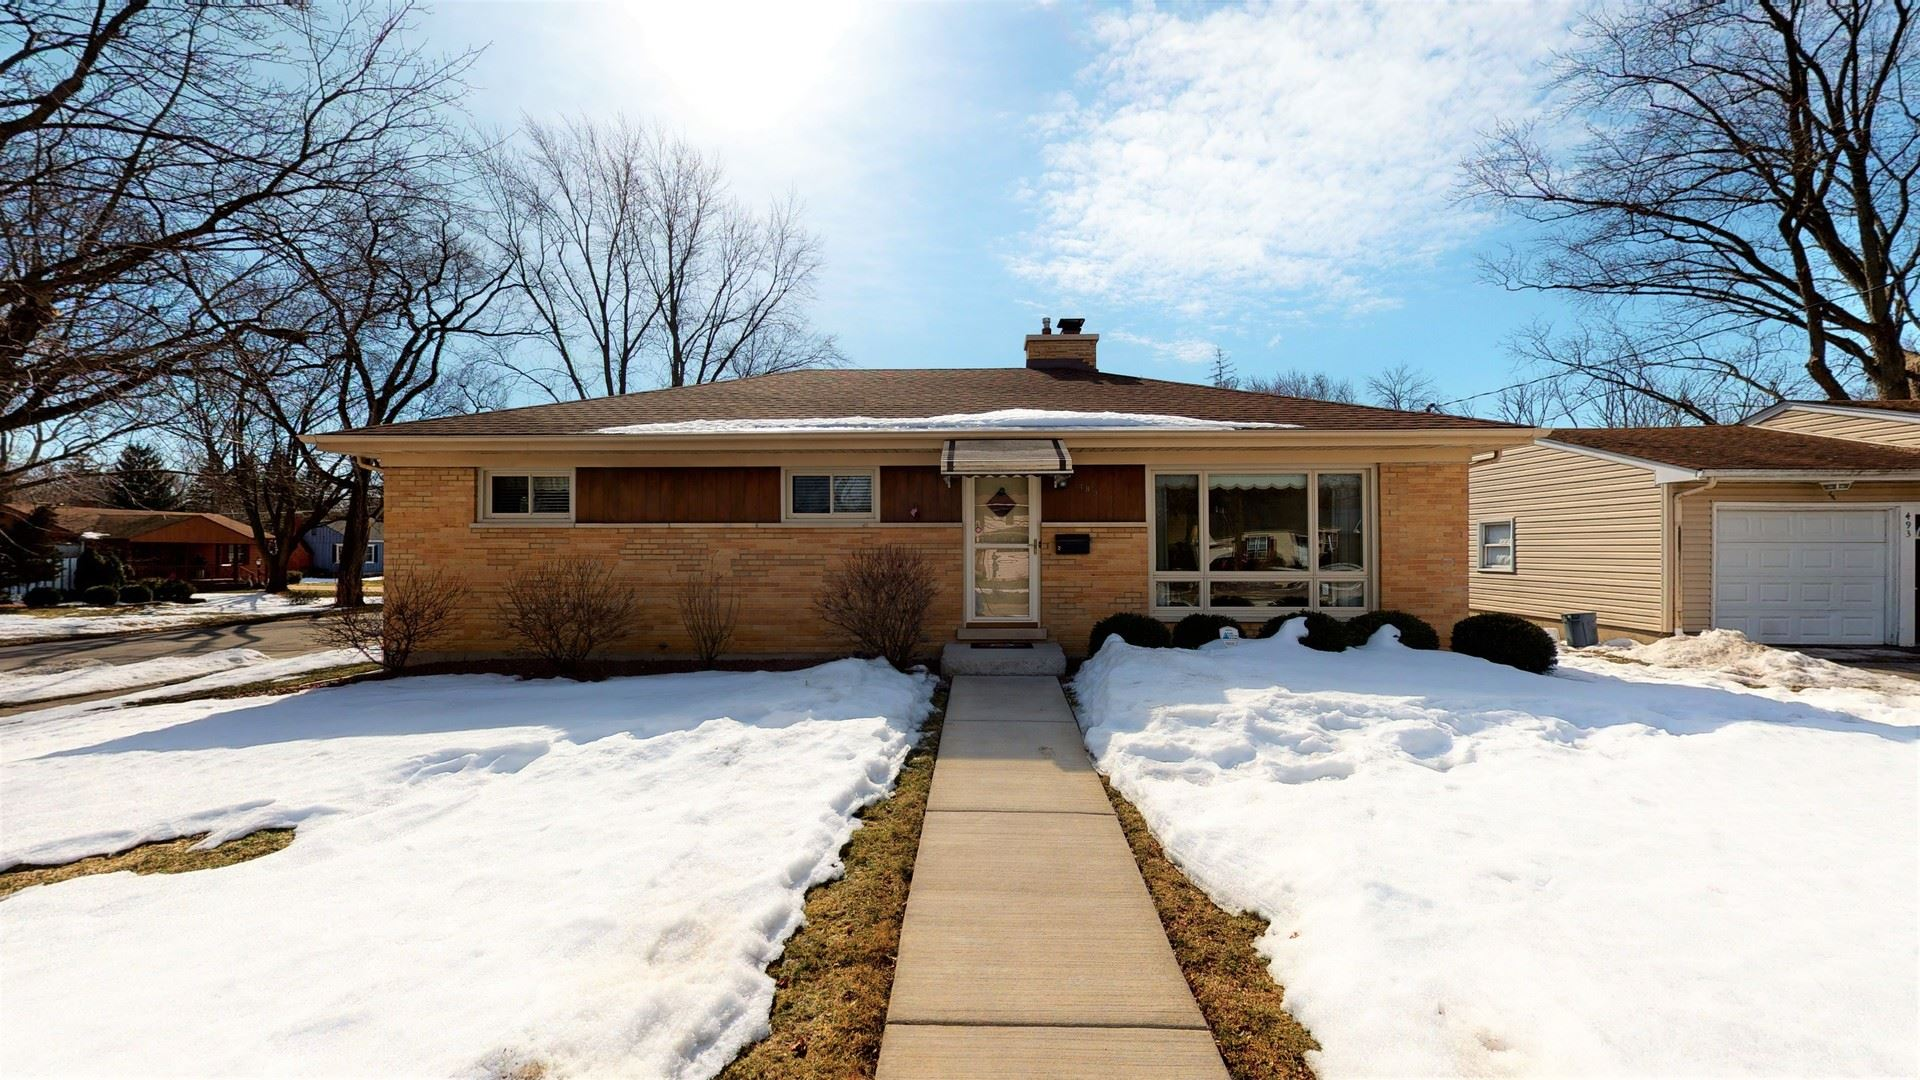 489 W Crystal Lake Avenue, Crystal Lake, IL 60014 - #: 11013233